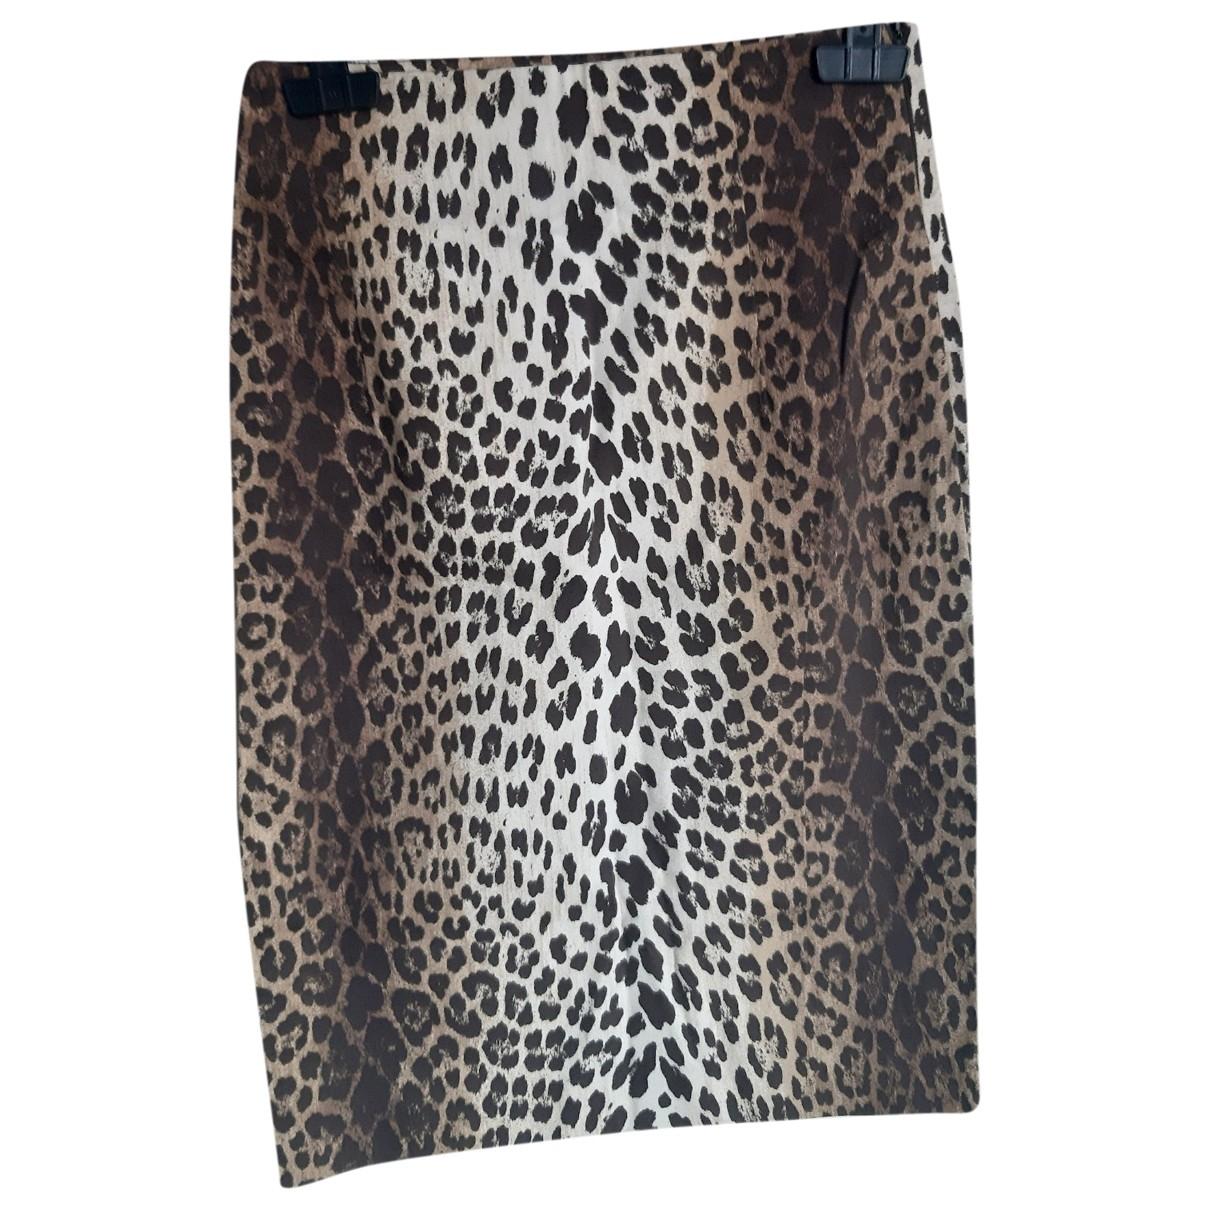 Moschino \N Multicolour Cotton - elasthane skirt for Women 44 IT